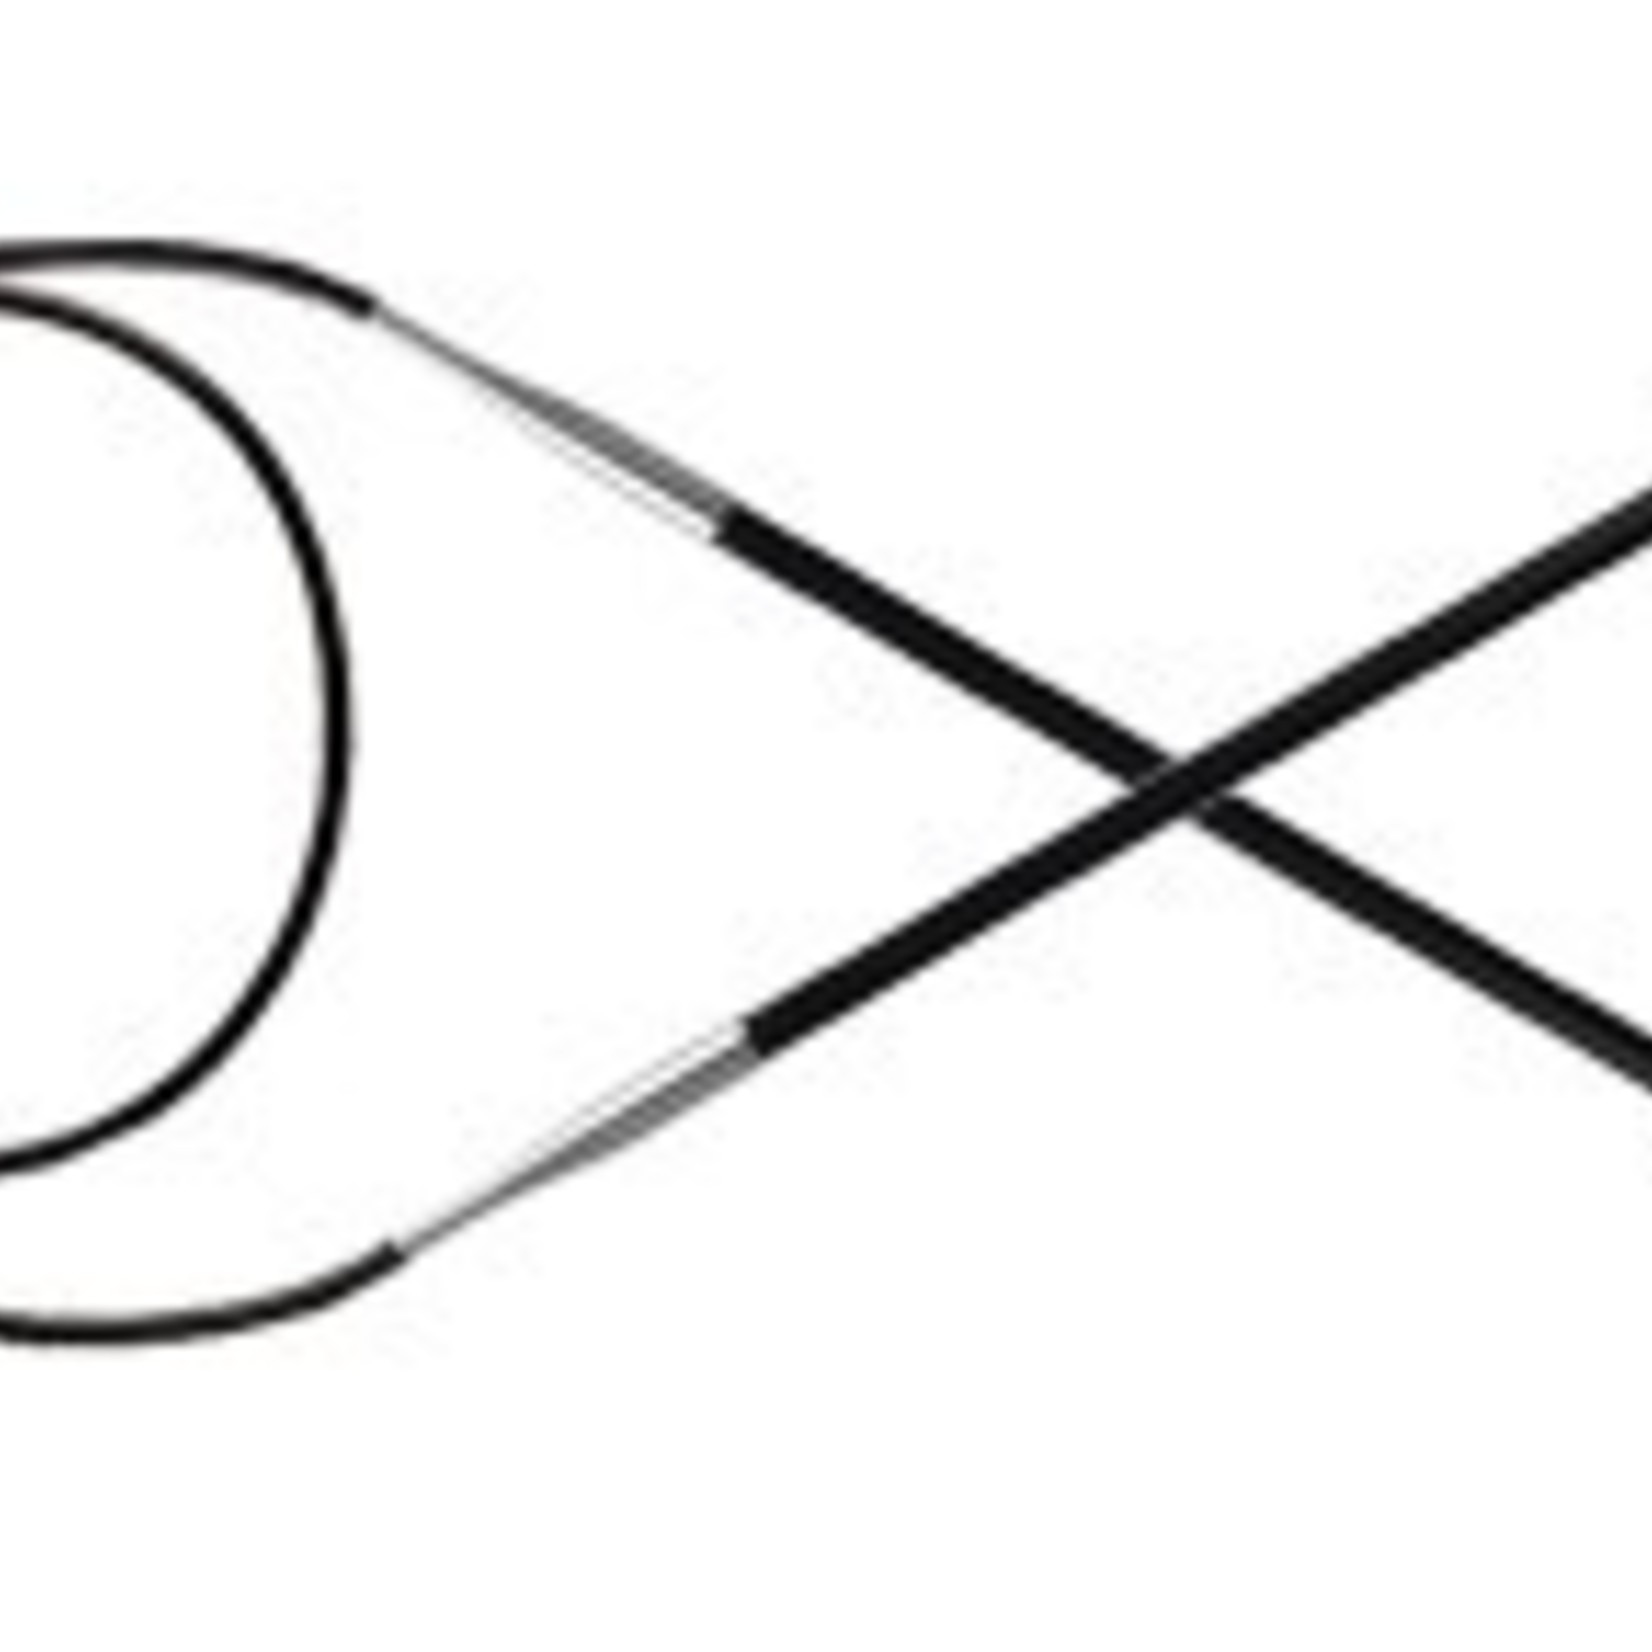 Knitter's Pride 1.5 Karbonz Circular 16